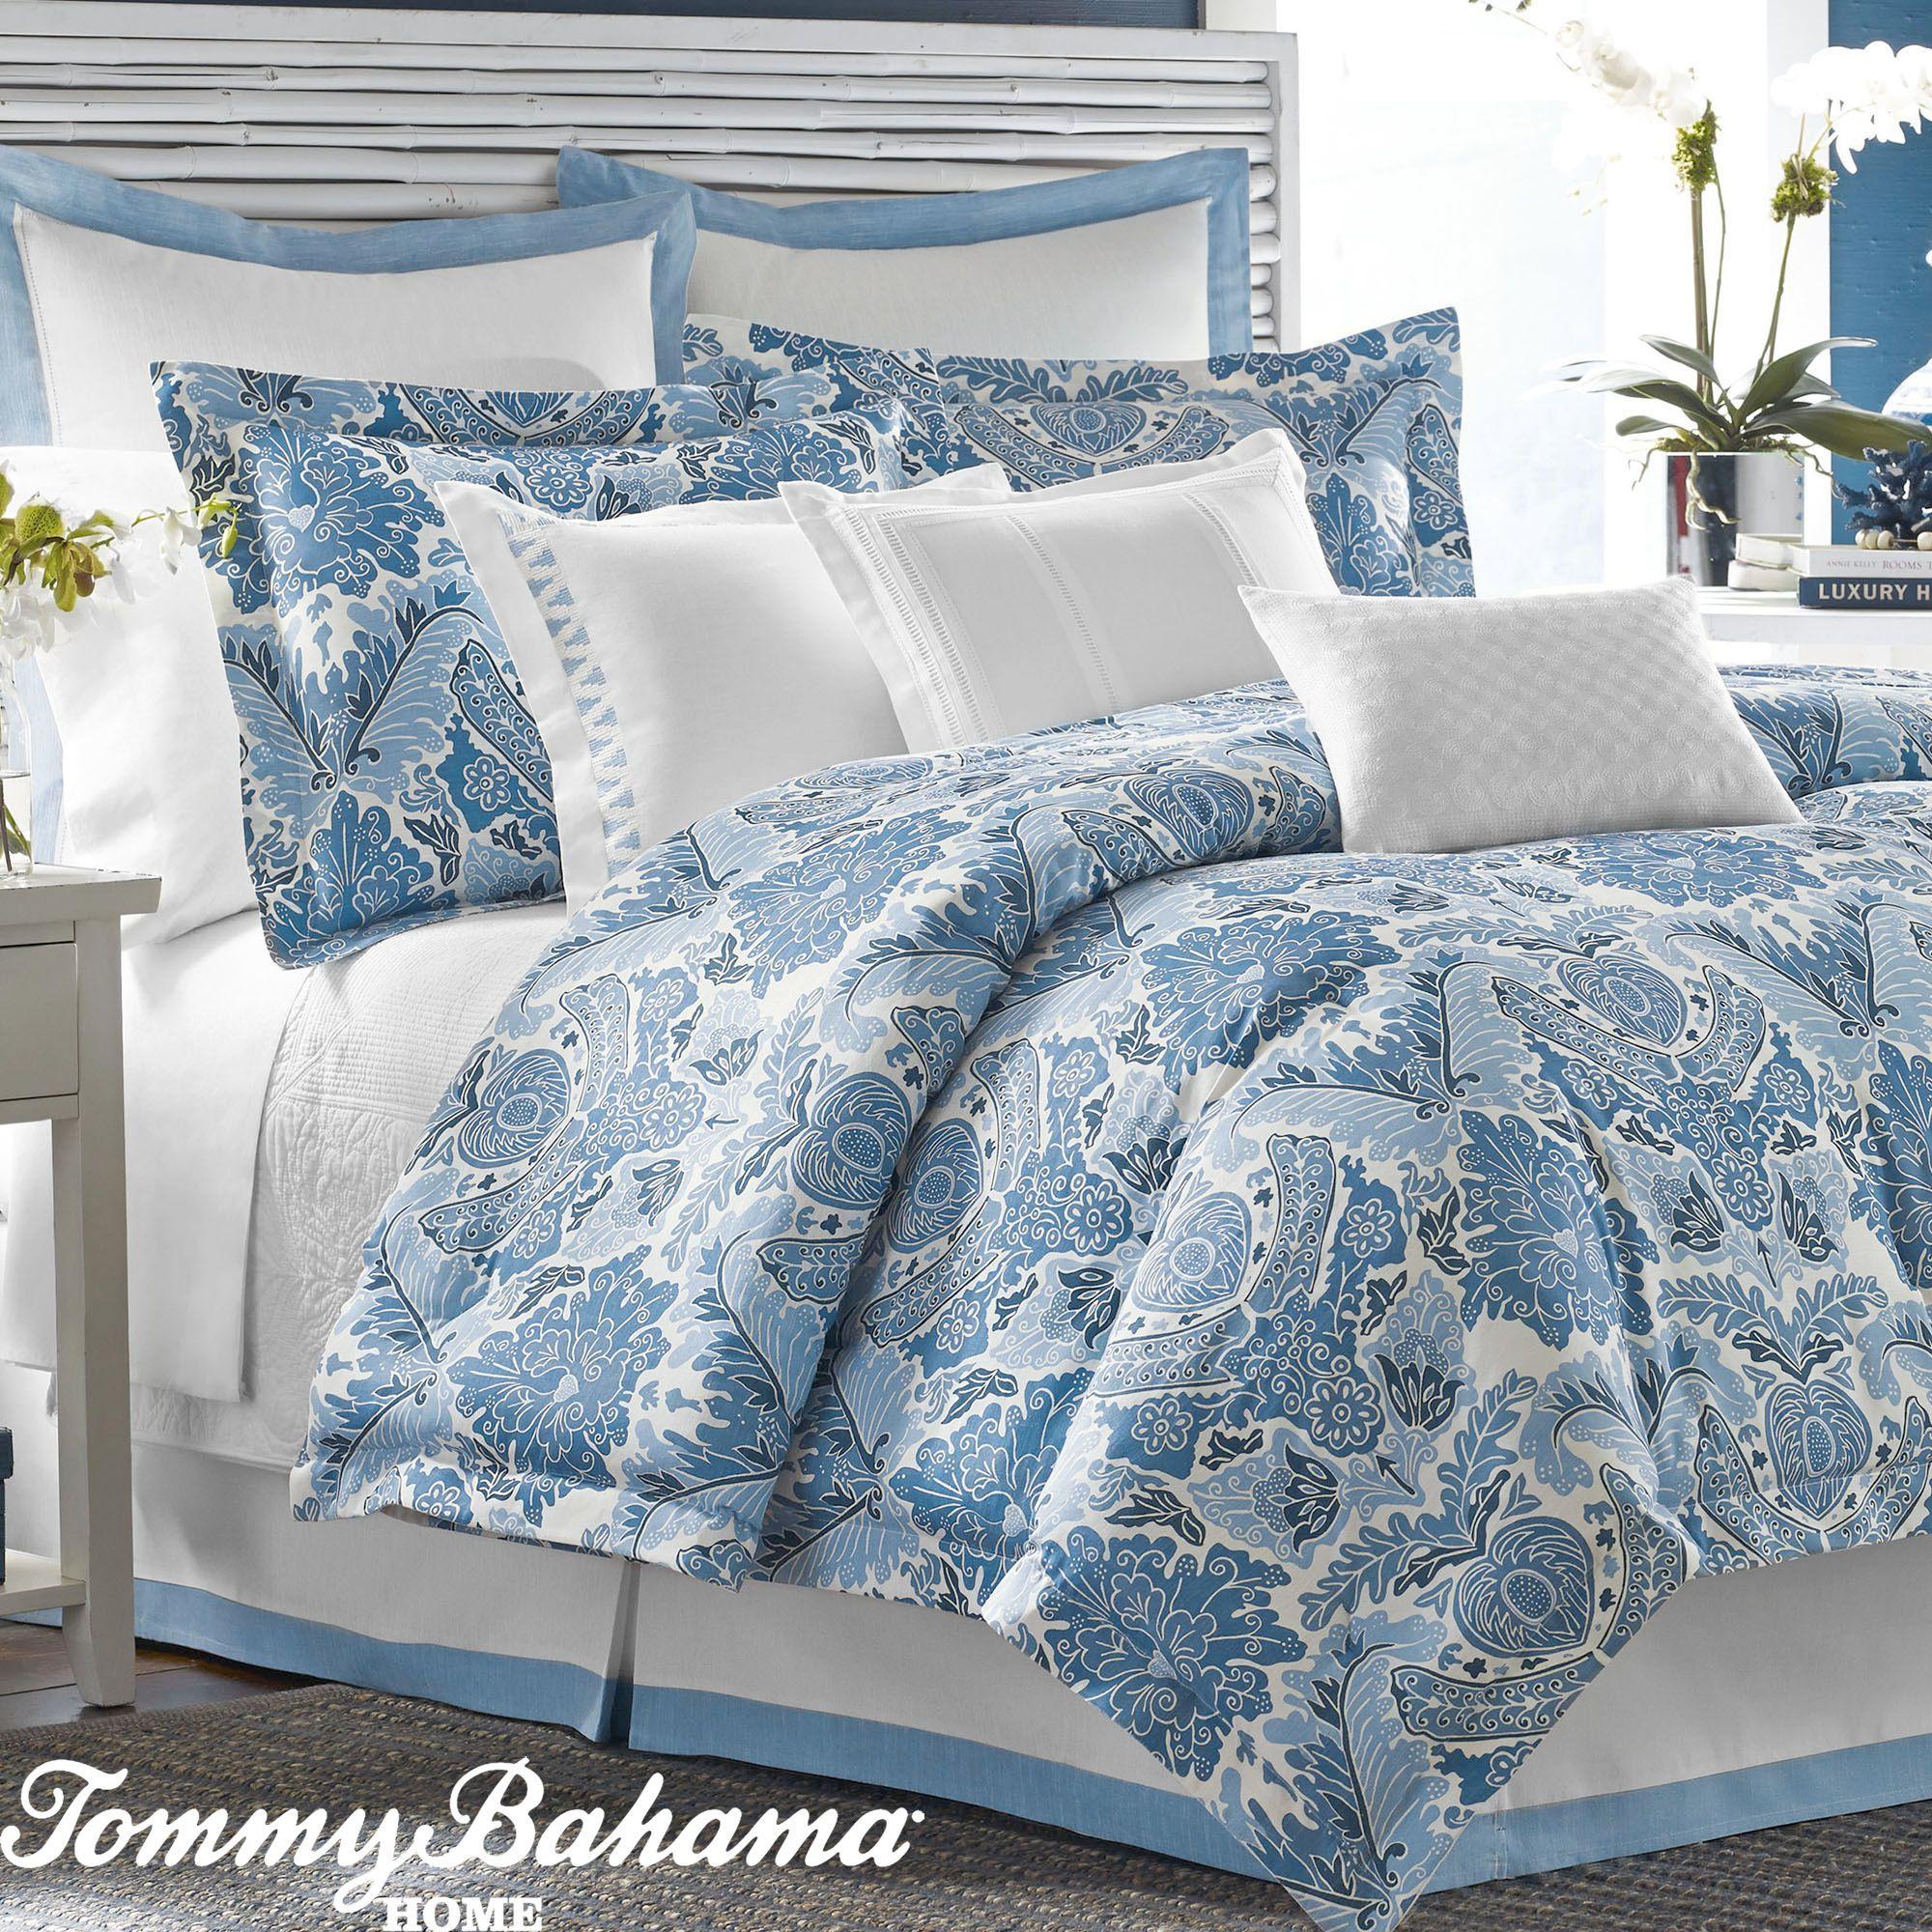 Porcelain Paradise Blue Comforter Bedding By Tommy Bahama Ensembles Literie Tommy Bahama Et Duvet